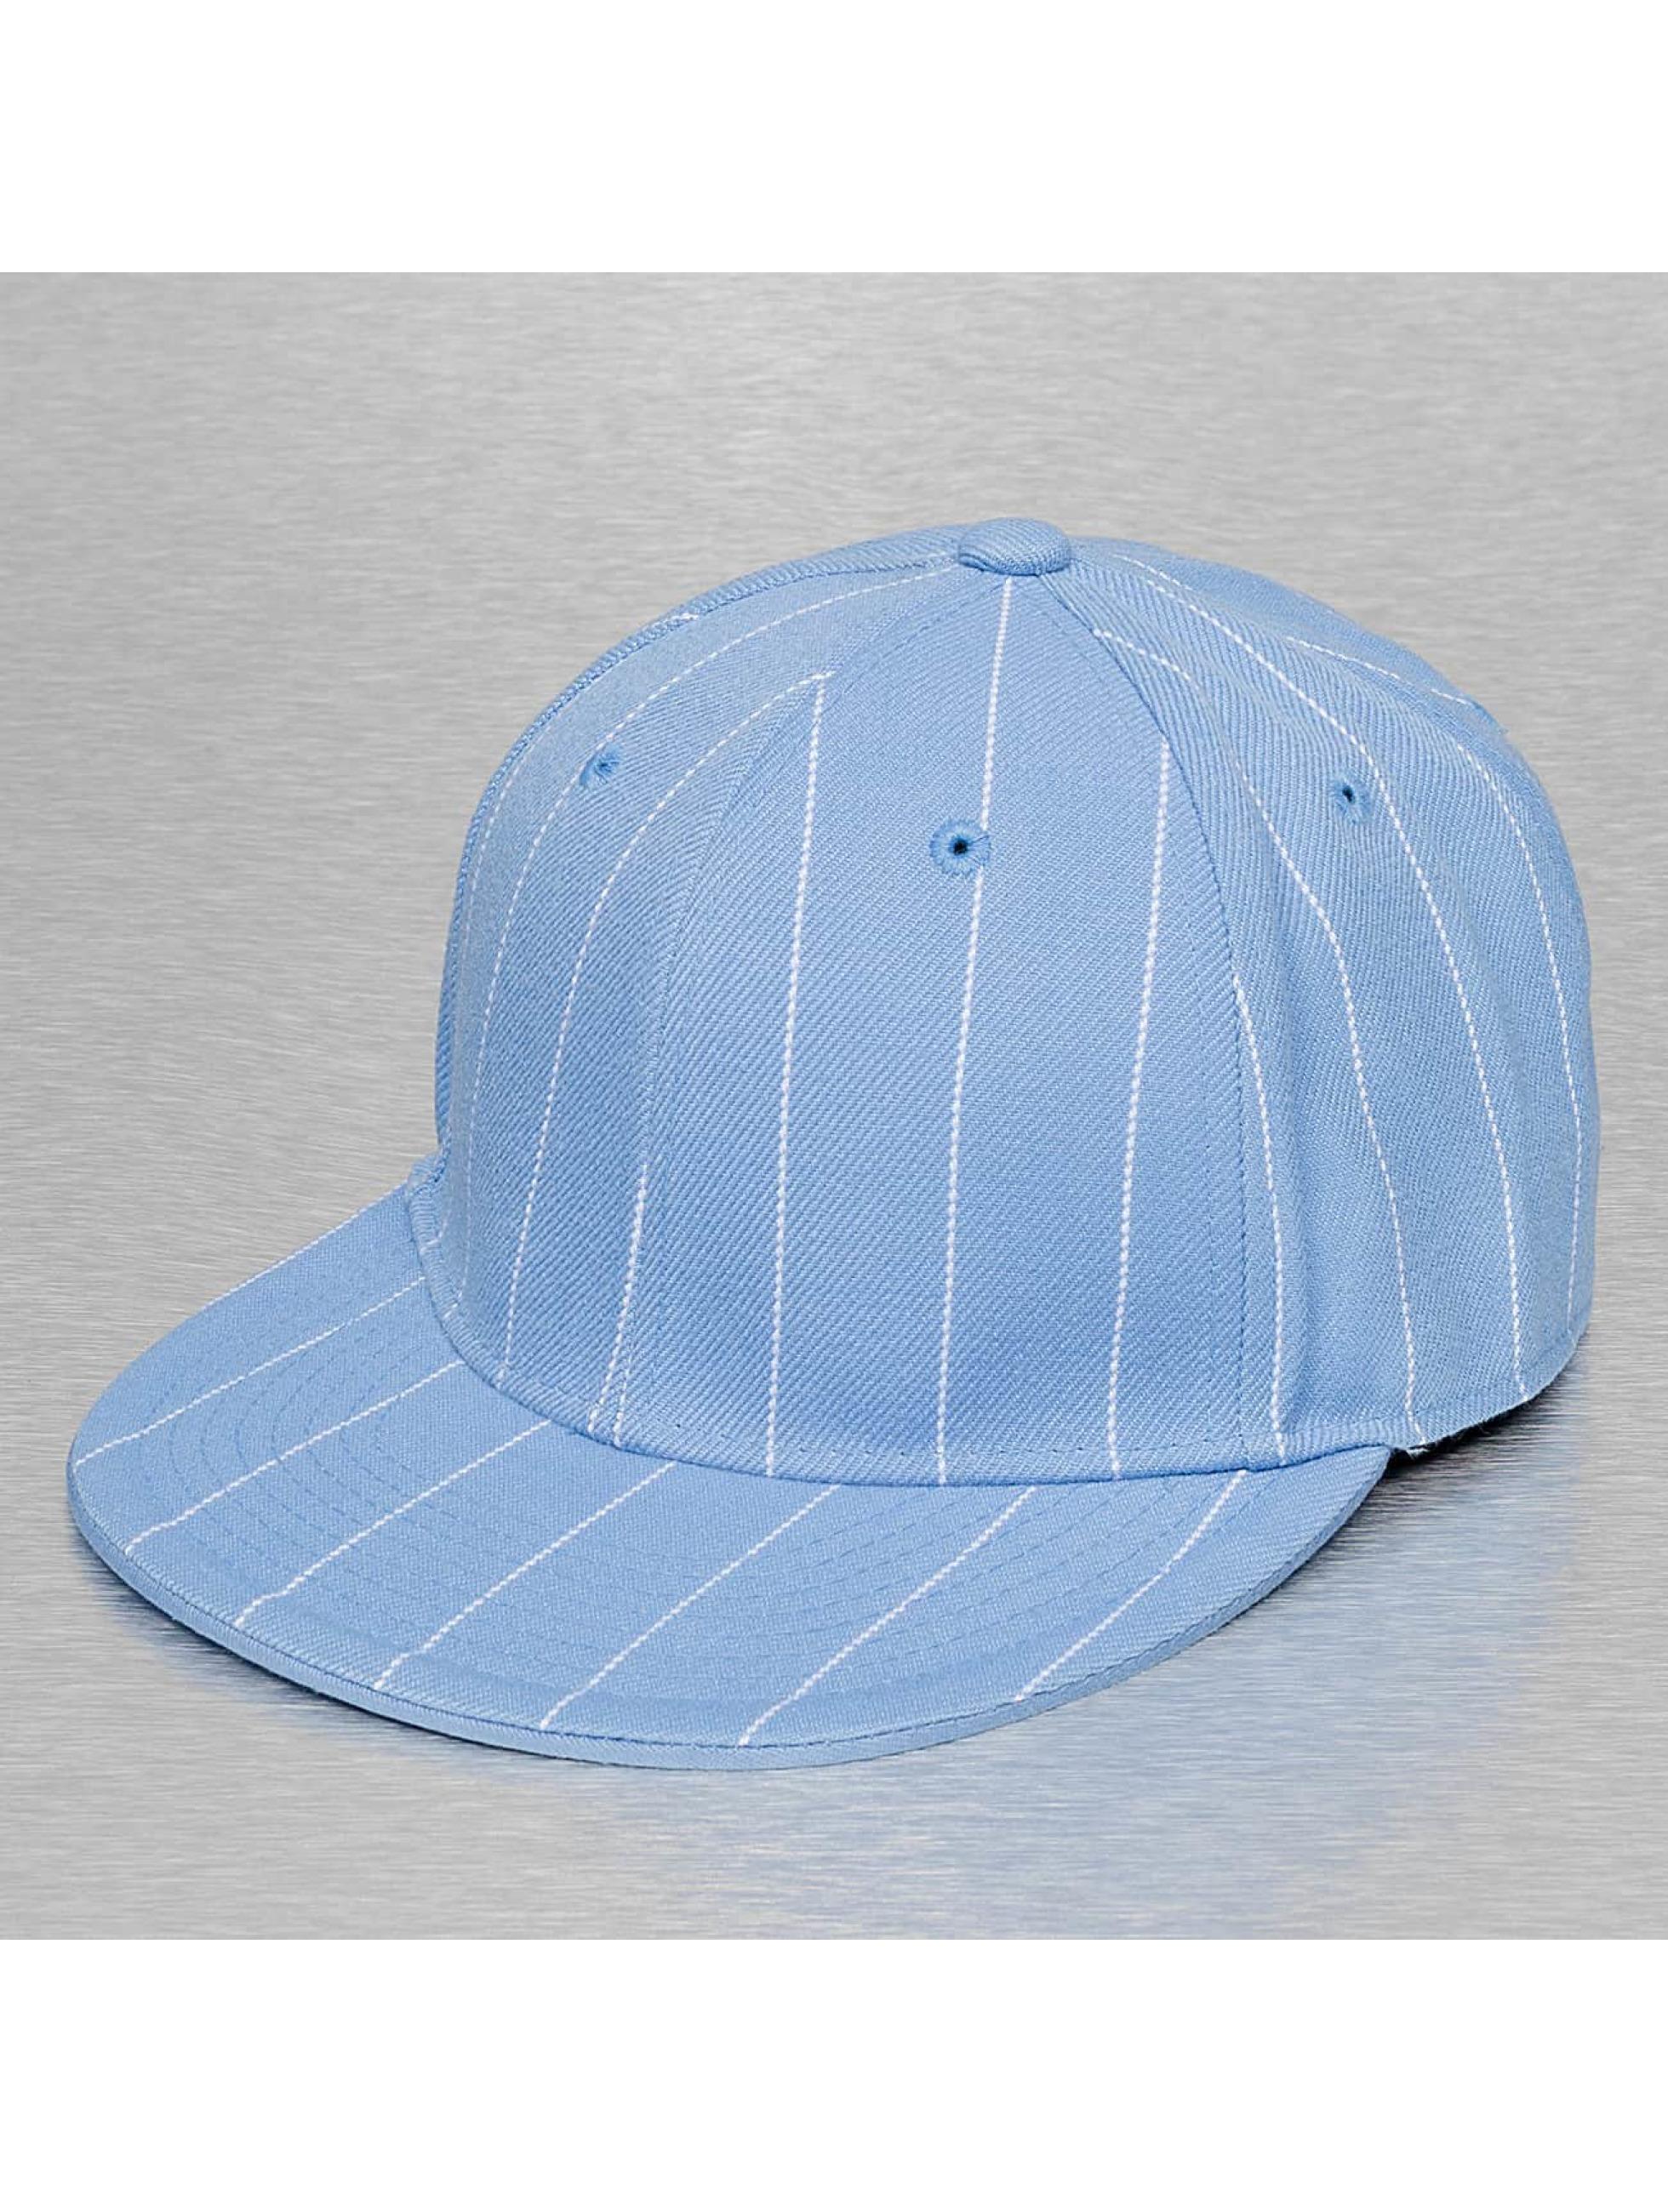 Cap Crony Бейсболка Pin Striped синий